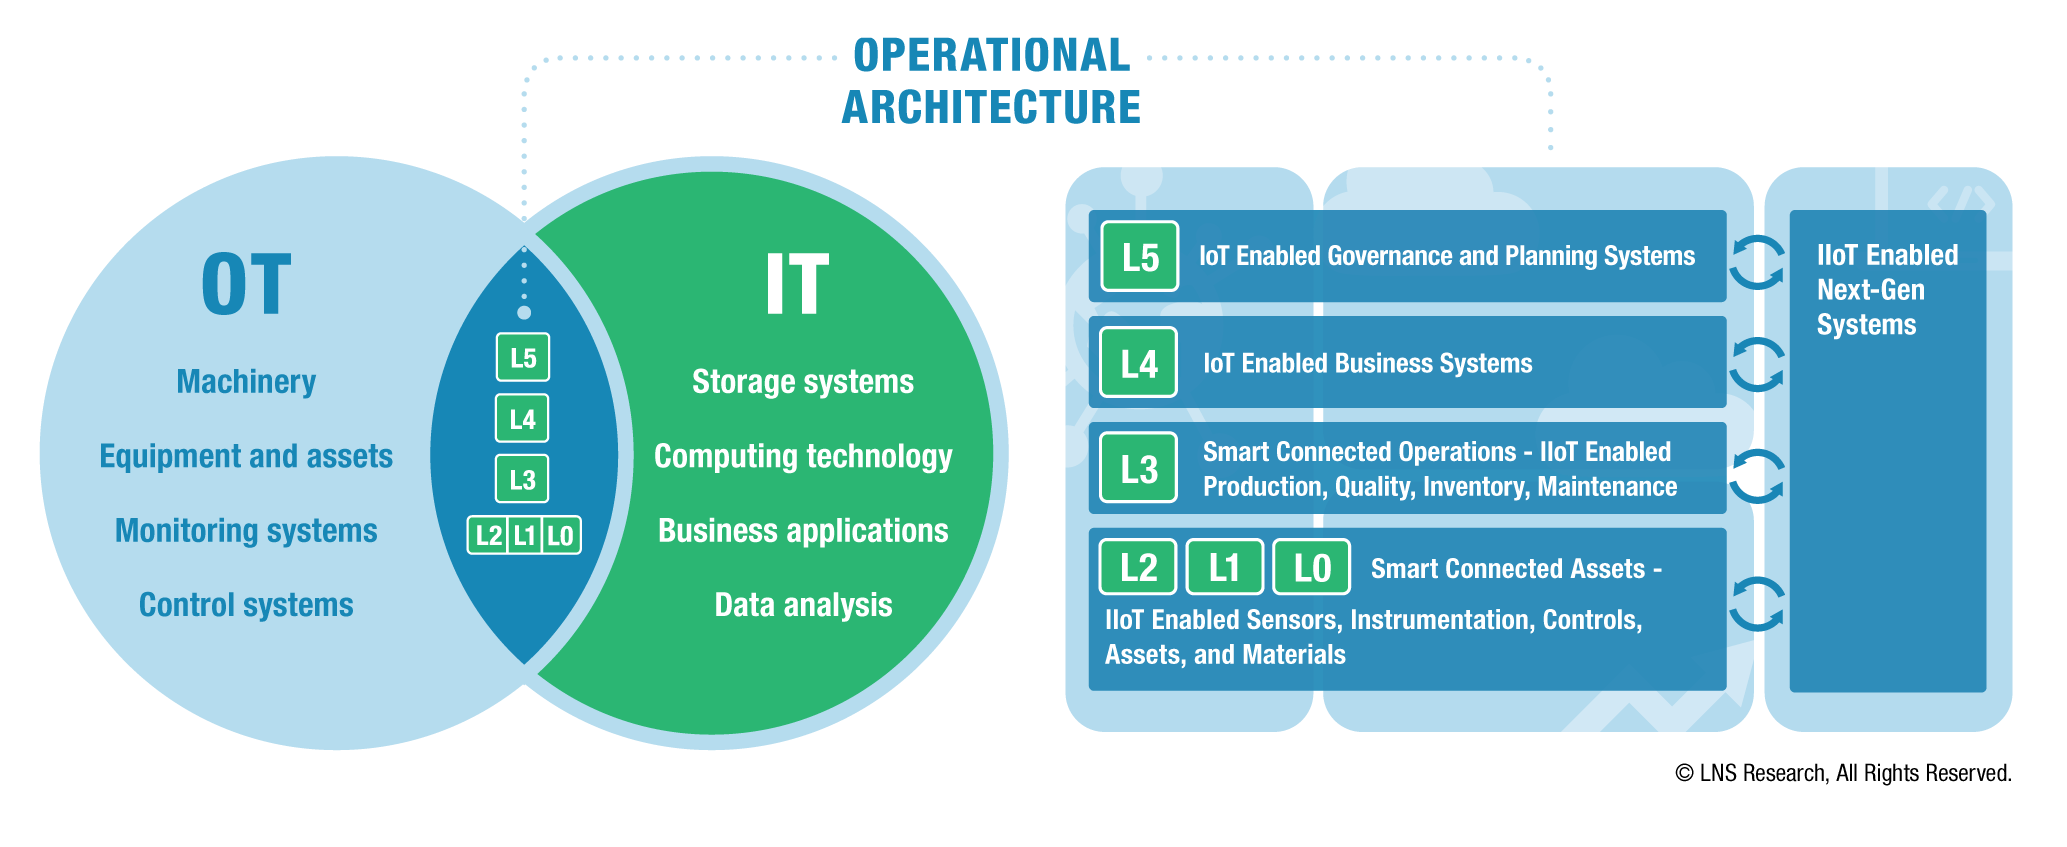 Operational Architecture - IT-OT Convergence